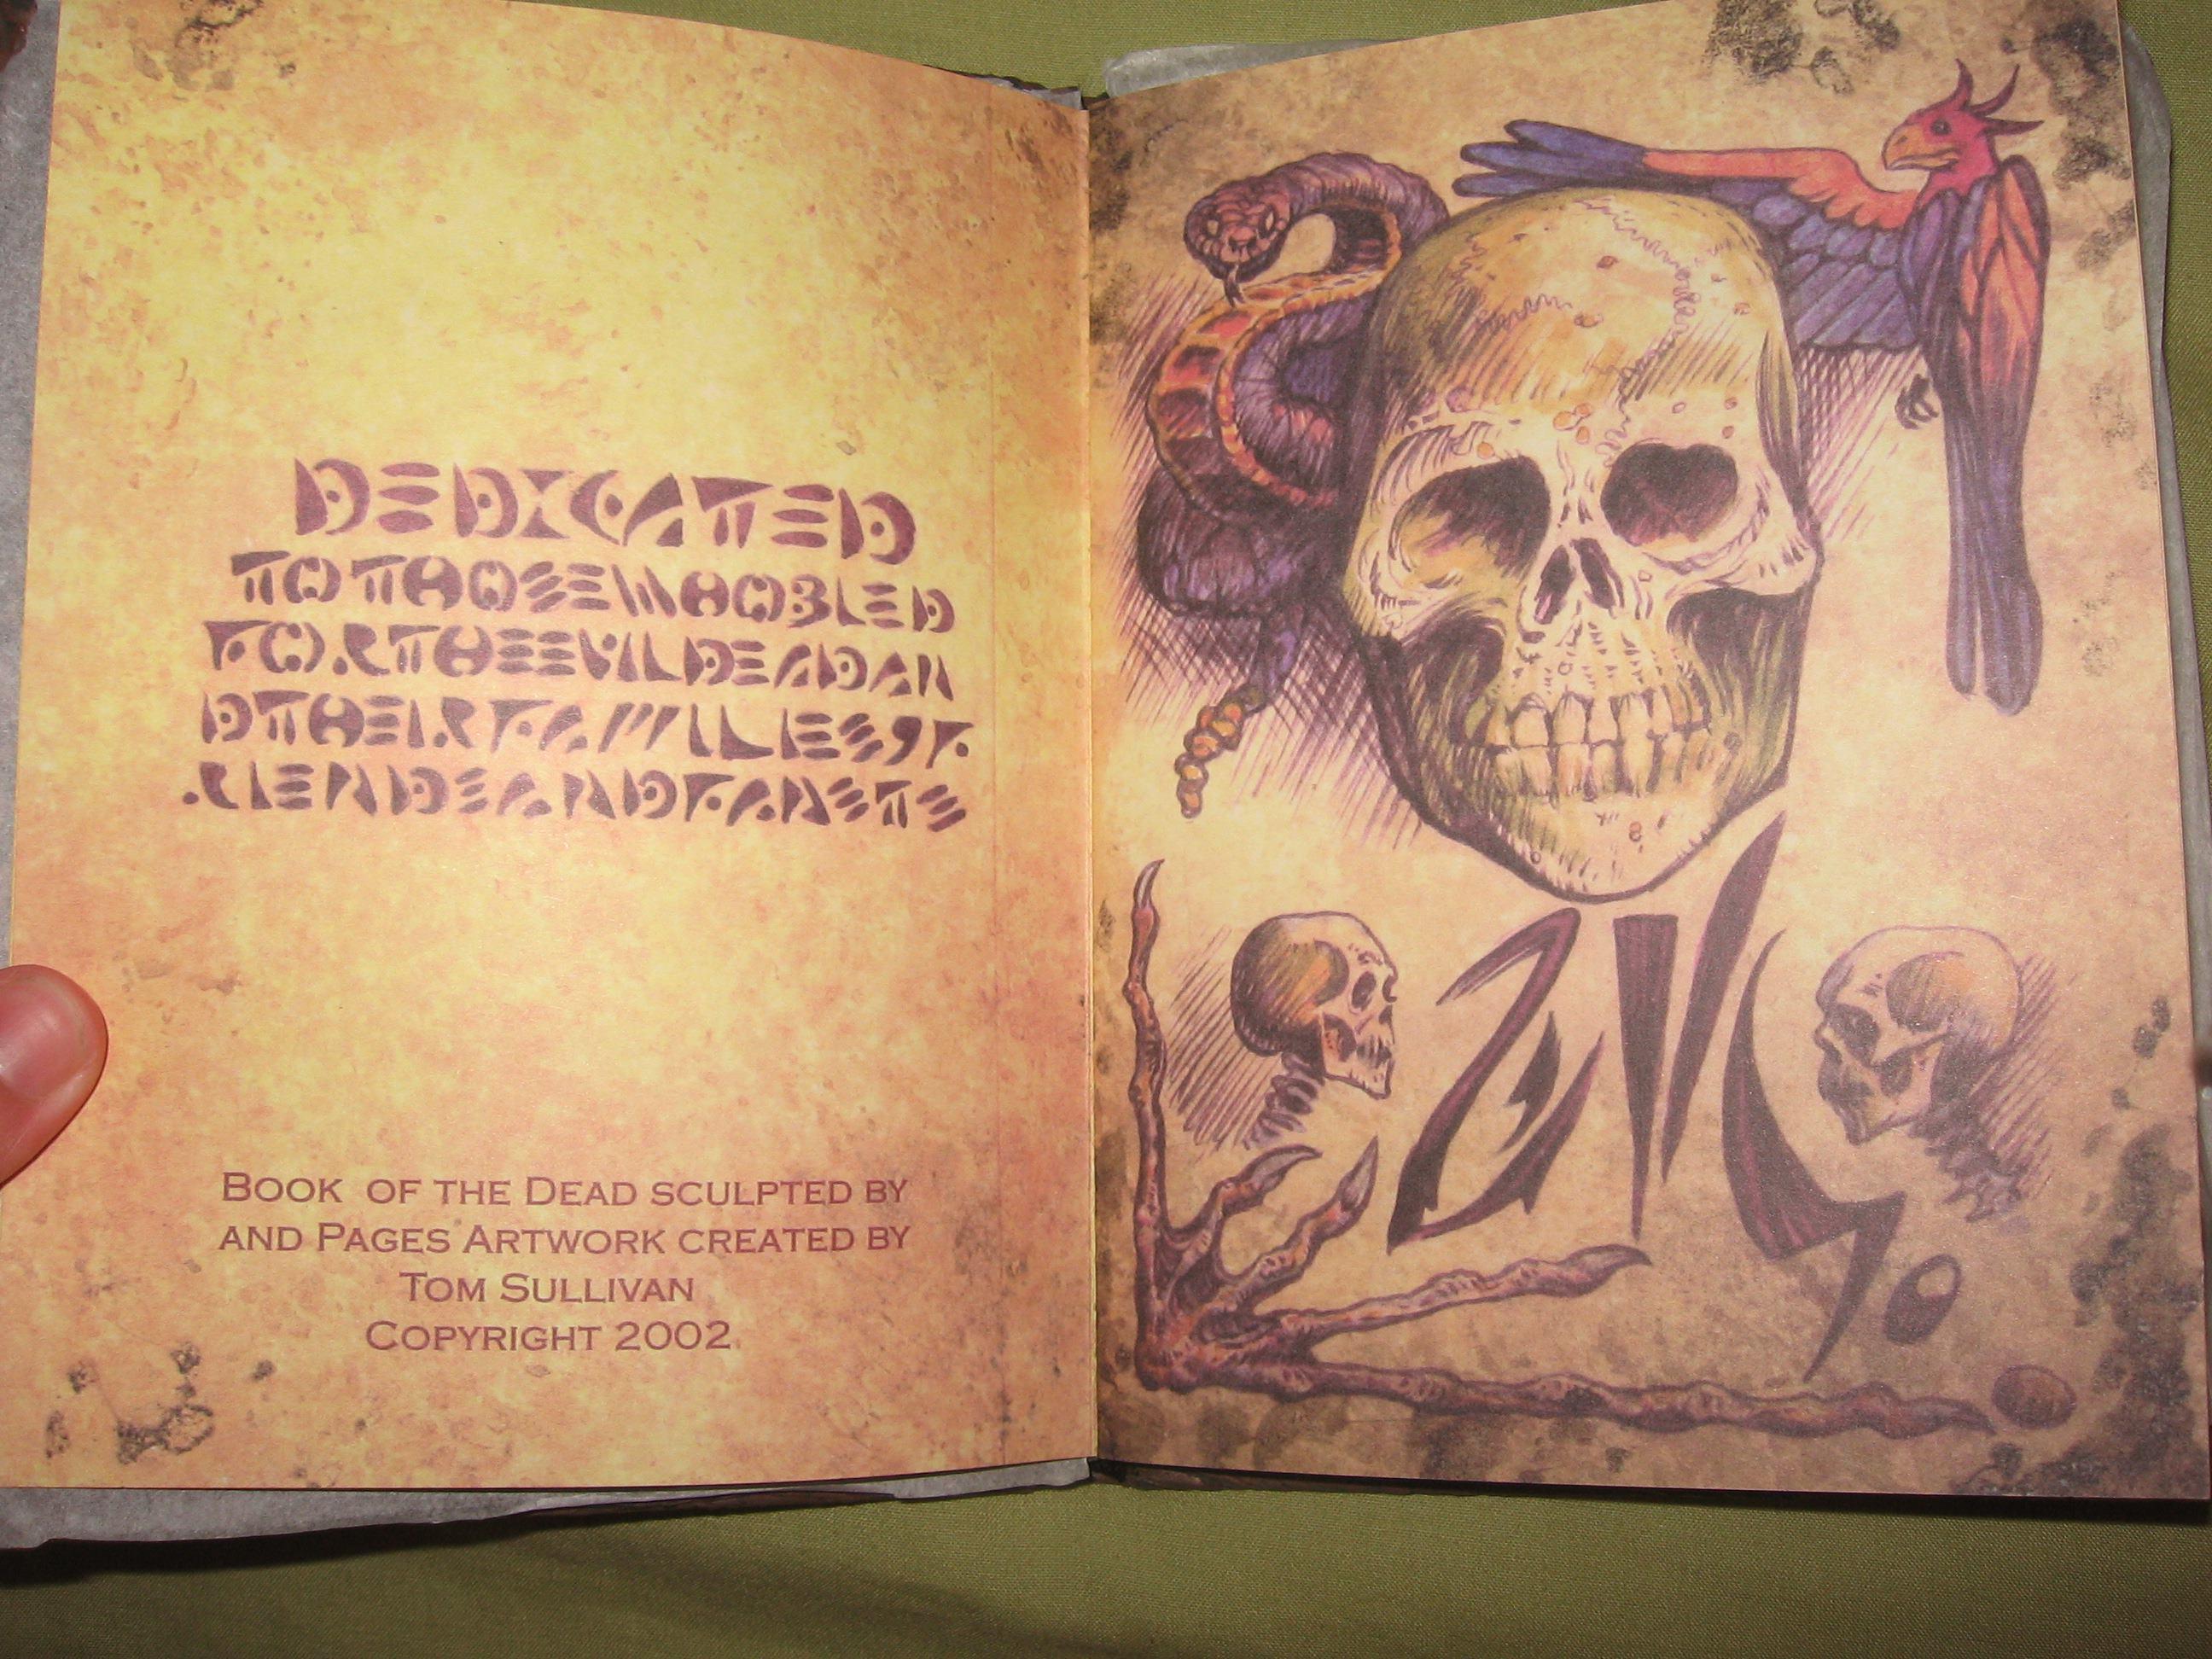 Book of dead Evil Dead Y4m5VWgvS-DbSASLsJmyMqKz9G6jAkjZj_DPEF-MKd6koGtQ7piwdtbBqQeV9f5a8maYycExhIM6eUzrG5QJB2993MplbEKKqwbZgON9vuvX2cAbQkYVvW1elMeTUThqwAh0bpbIRNCDK5doVZFI1_GMg08IFzmlKJZC6ePzpFY92Ge8SjJC0wBG9aNSFLKXNUApbJKO5yL1GG7Dy7OVdFRCg?width=2592&height=1944&cropmode=none